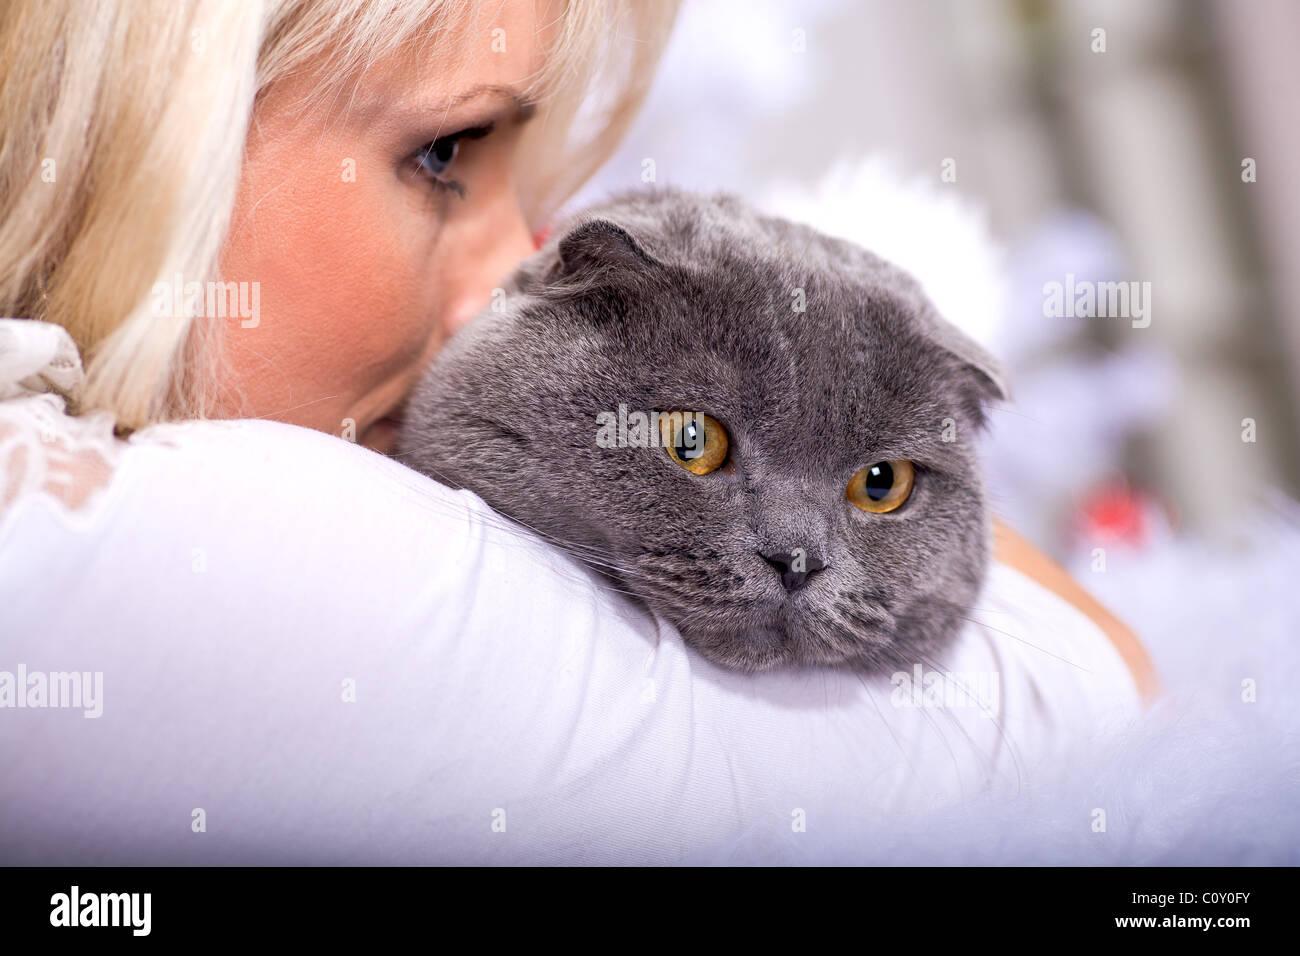 xmas portrait of a cat Stock Photo